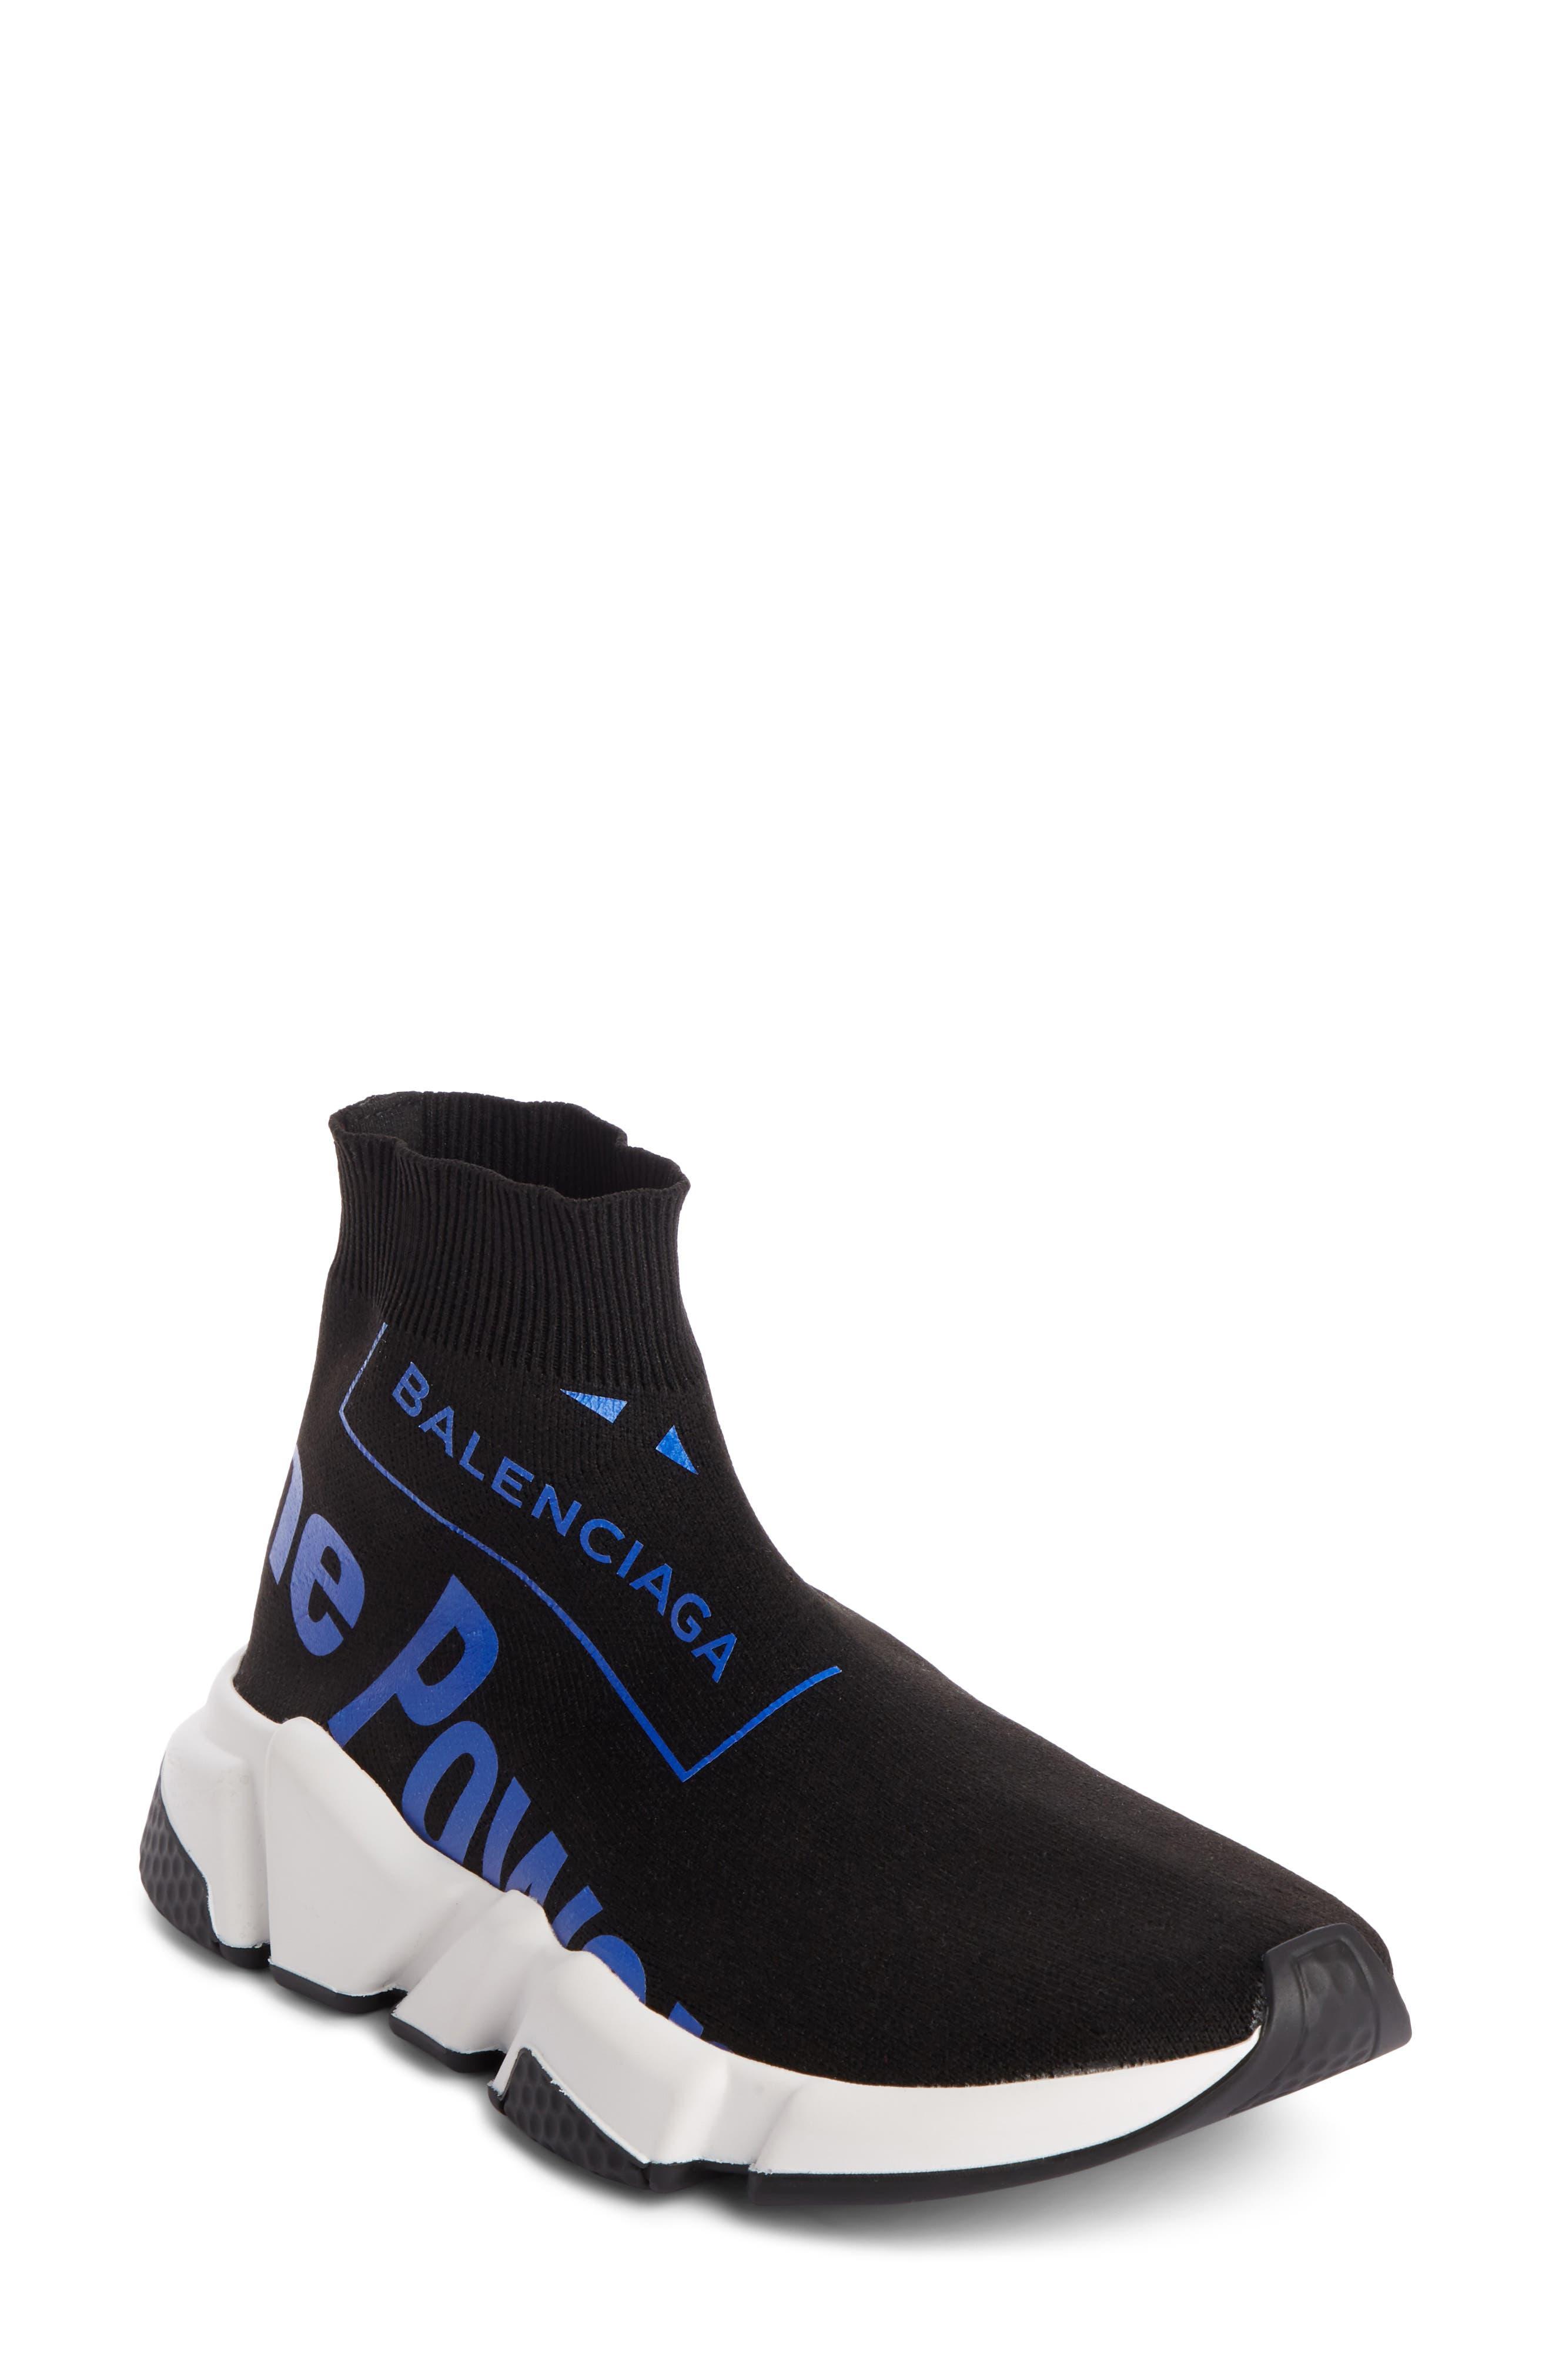 Dream Speed Trainer Sneaker,                             Main thumbnail 1, color,                             Black/ Blue